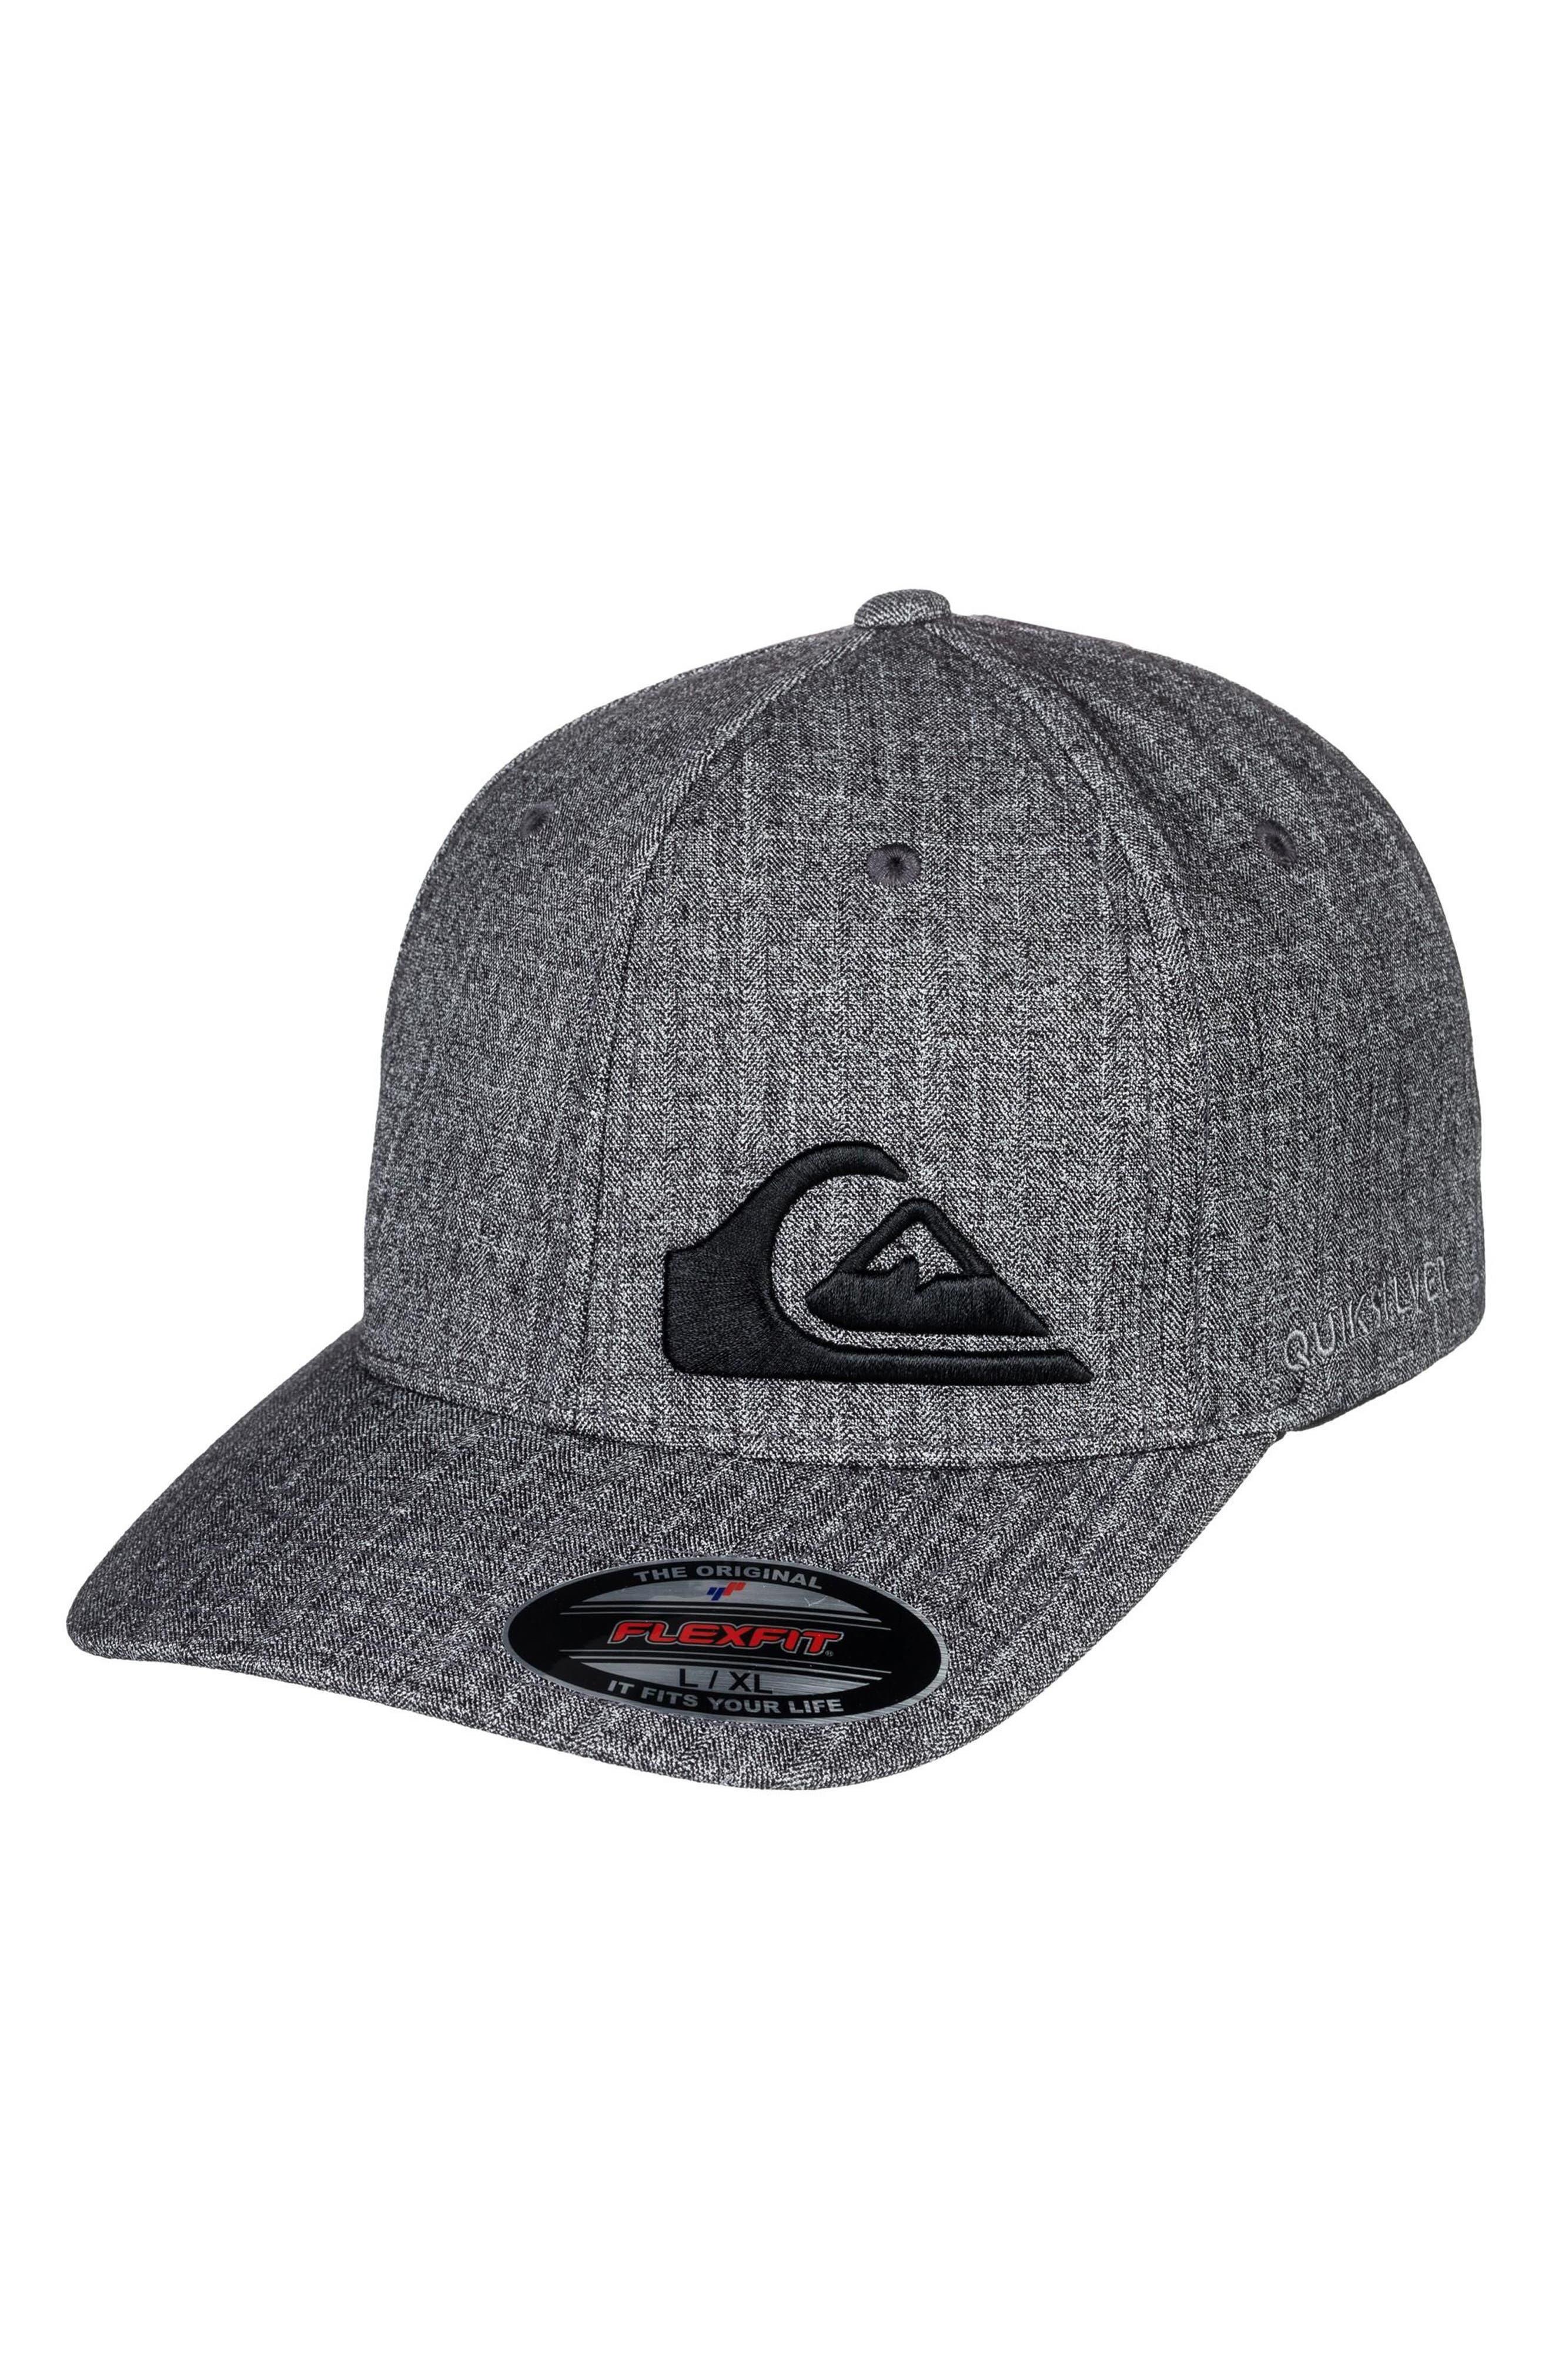 Final Flexfit Ball Cap,                         Main,                         color, Dark Charcoal Heather